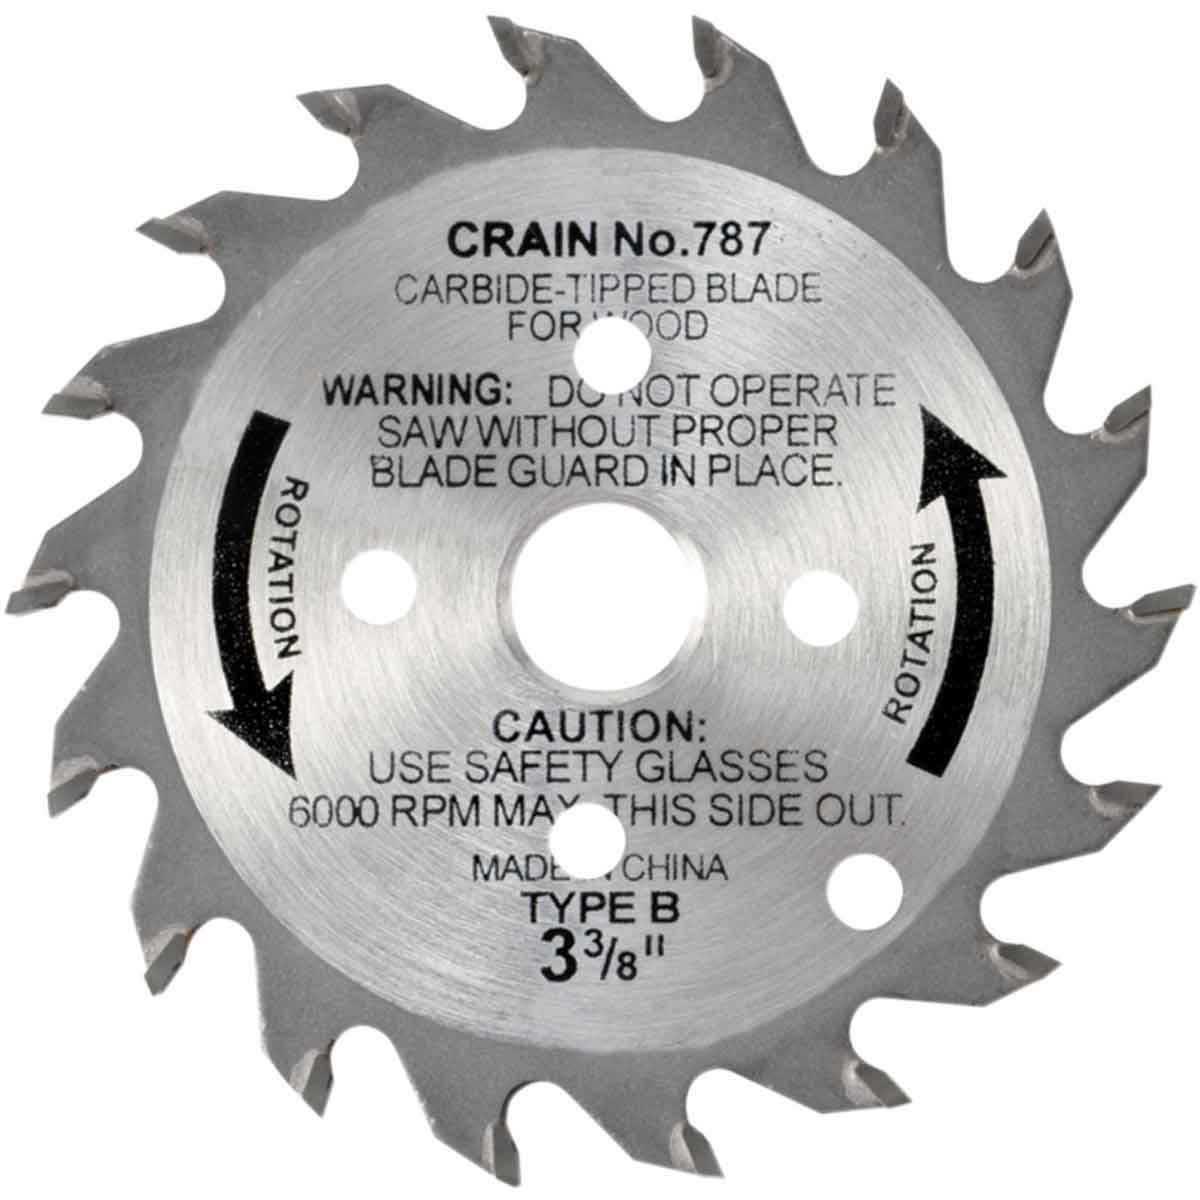 787 crain carbide tipped blade